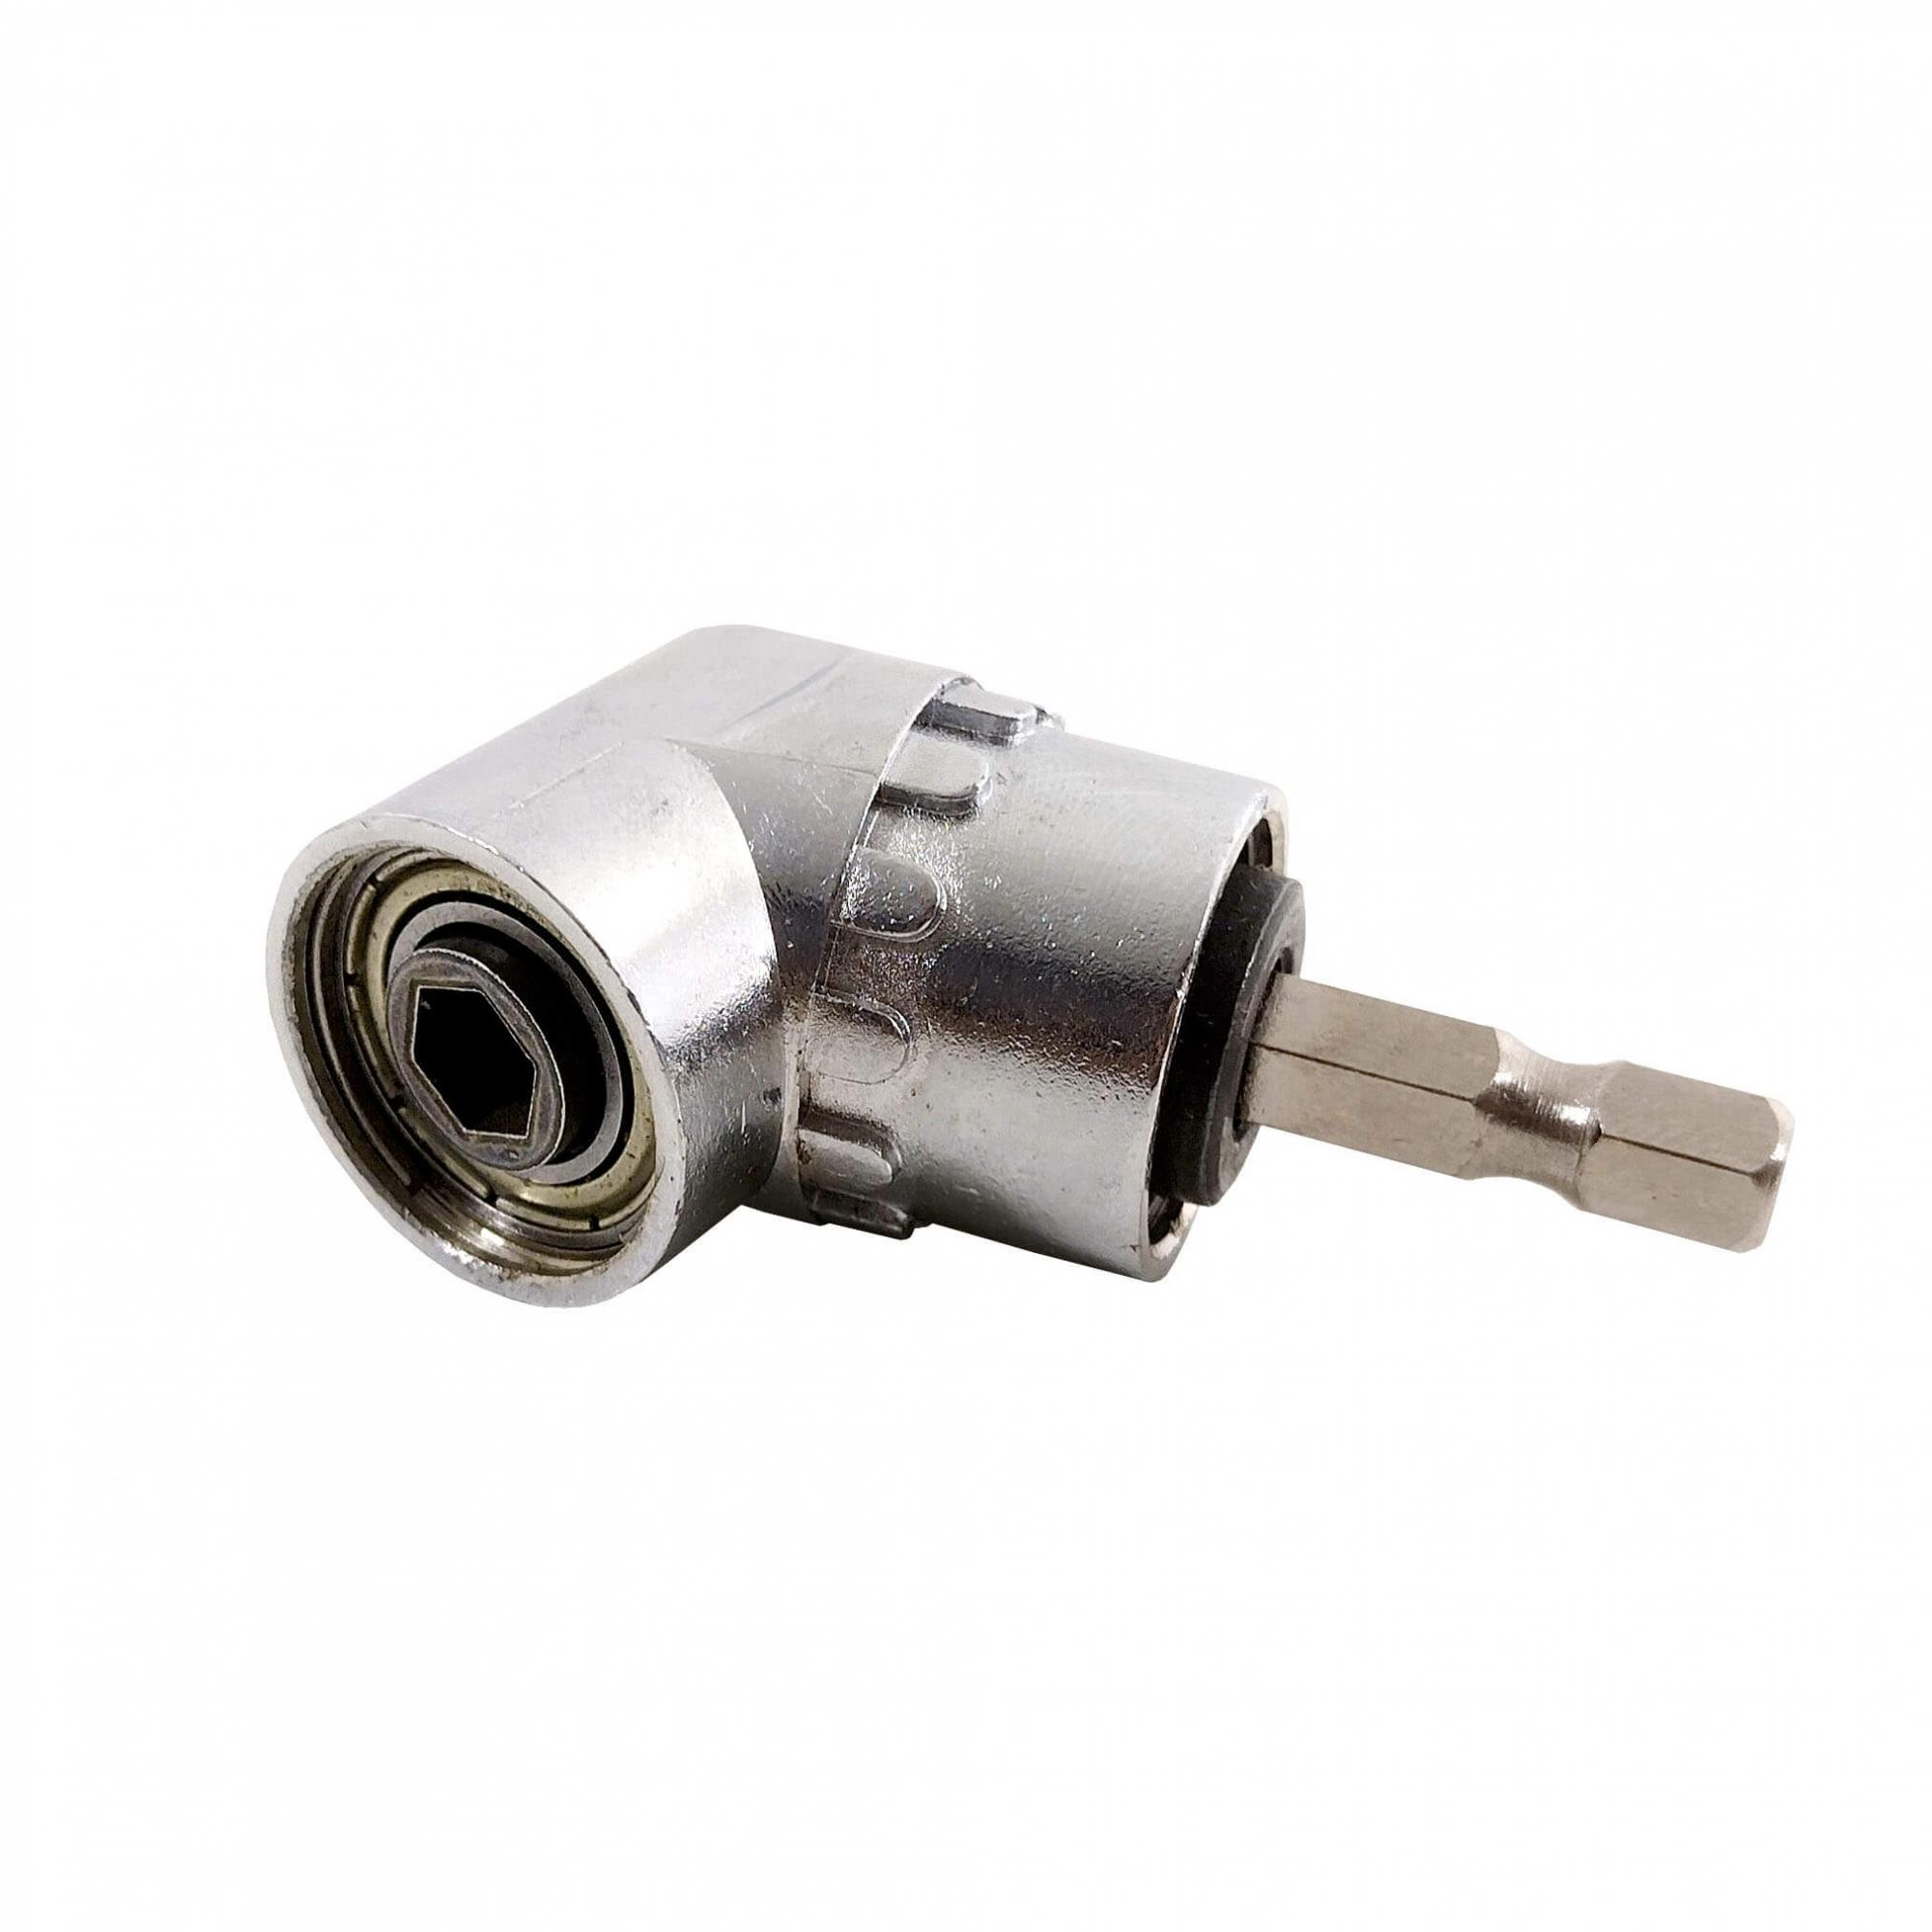 Adaptador Magnético 90 graus 60mm